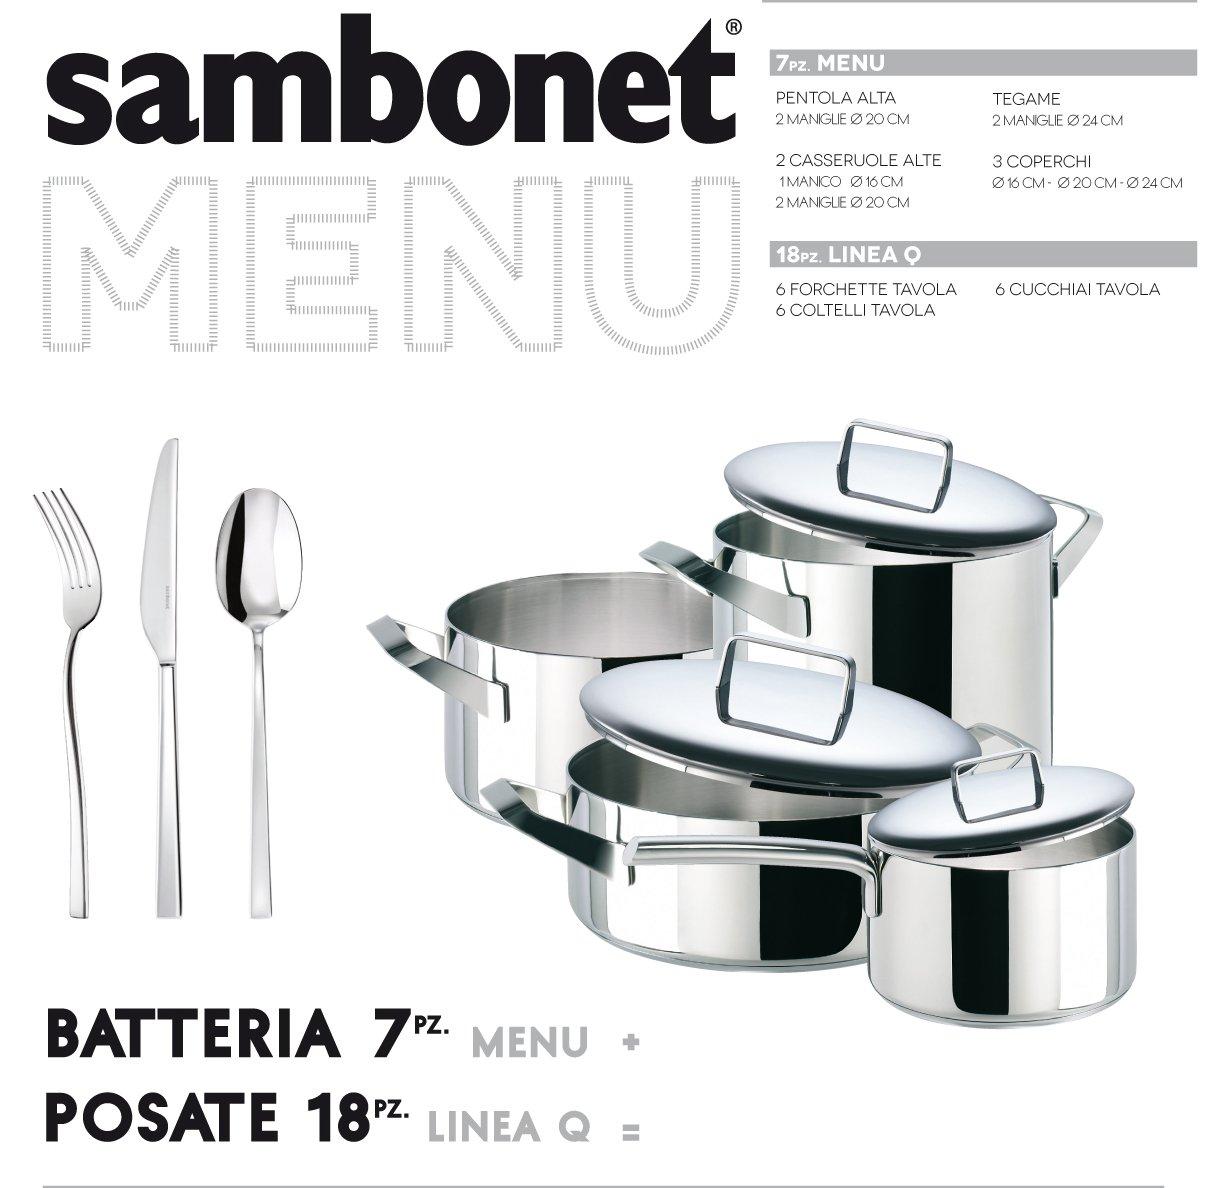 Sambonet Serie Menù Casseruola alta